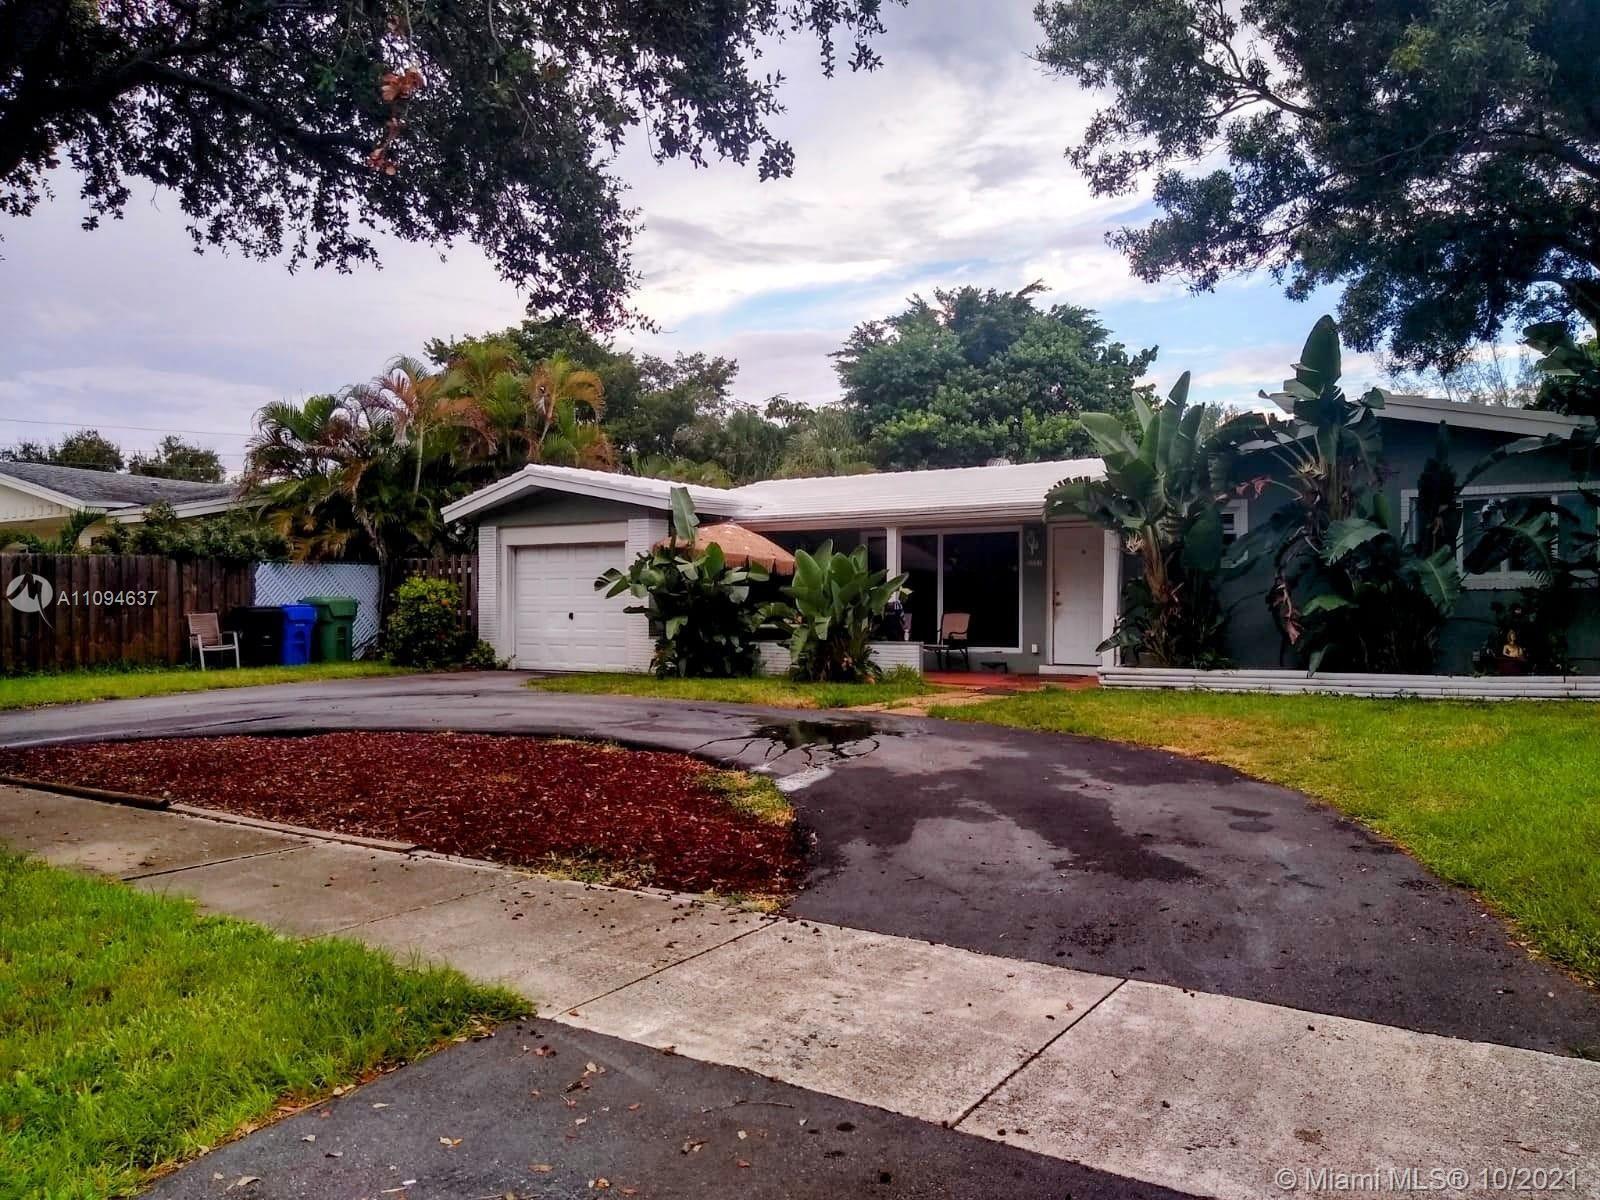 2211 NE 62nd St, Fort Lauderdale, FL 33308 - #: A11094637